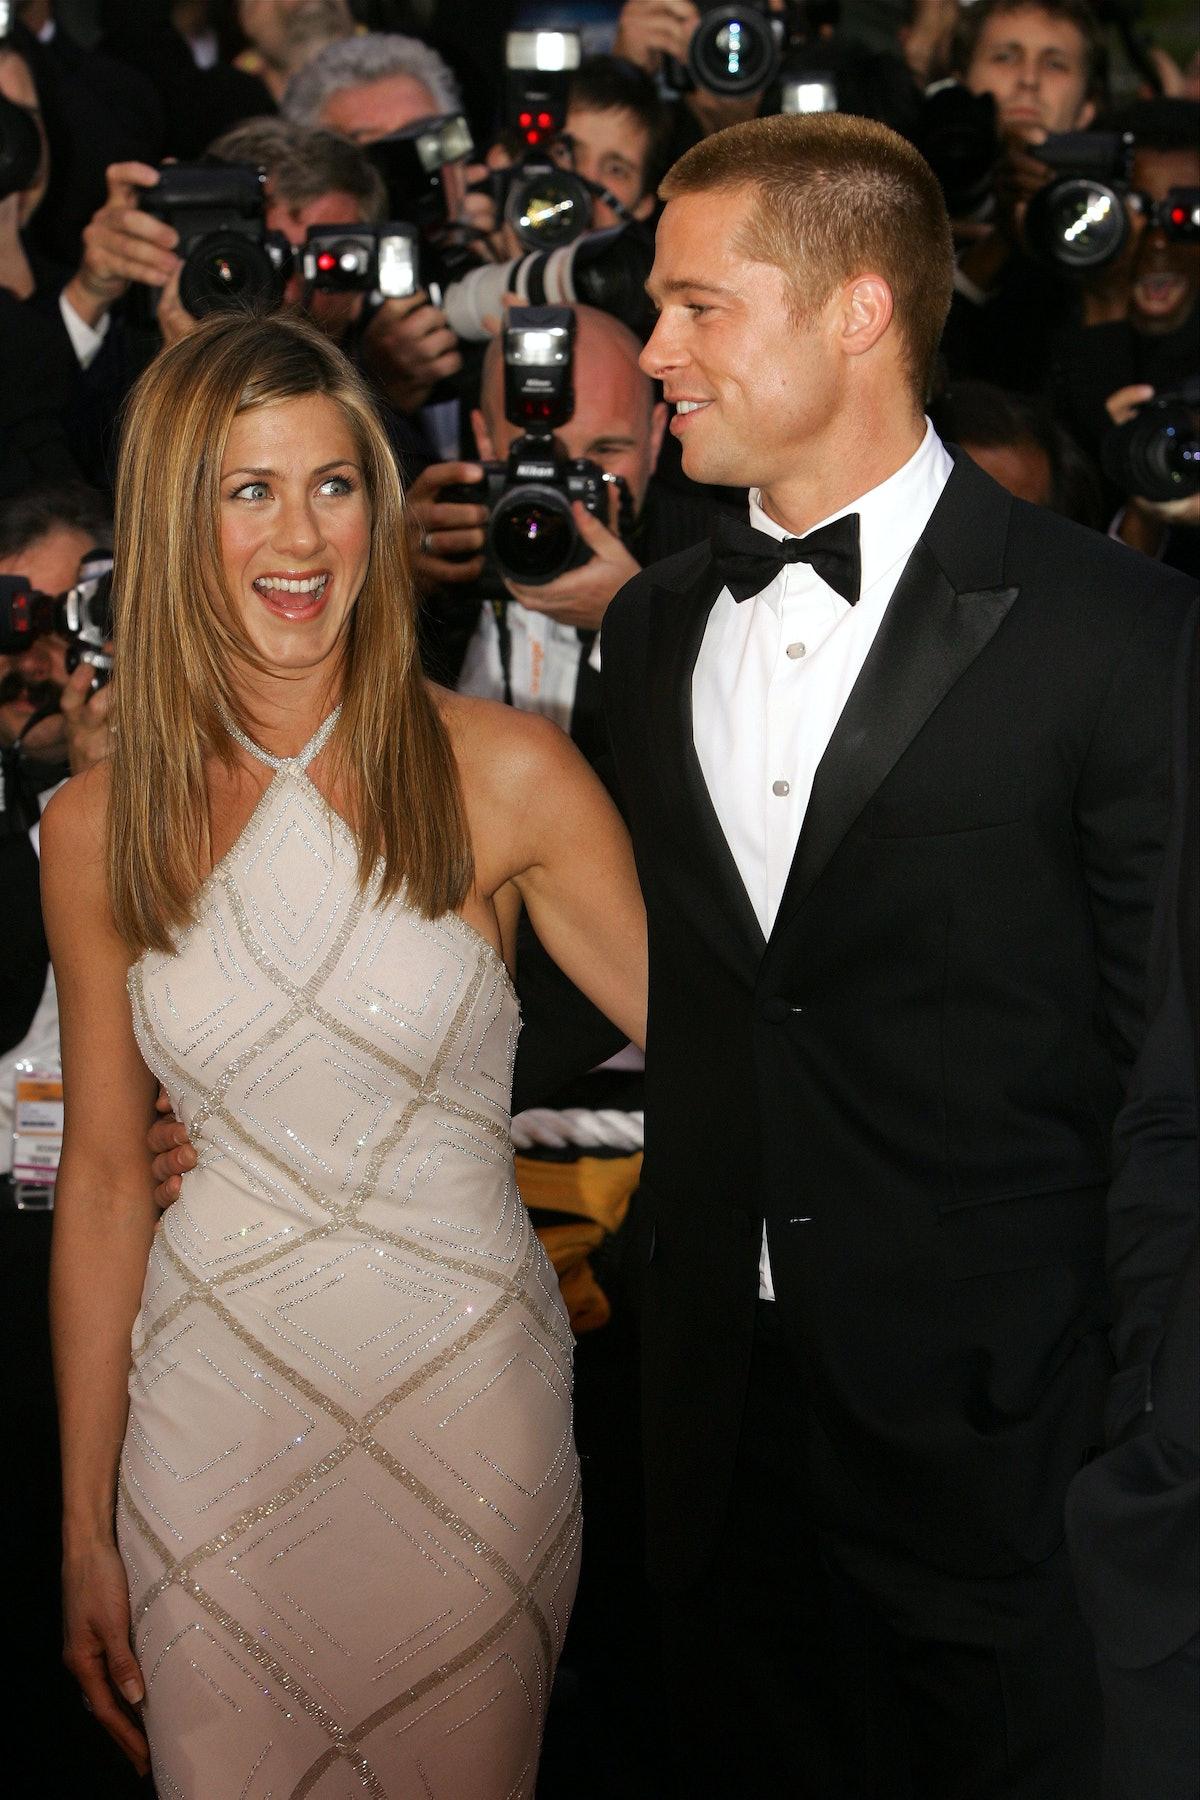 Brad Pitt and Jennifer Aniston were married.